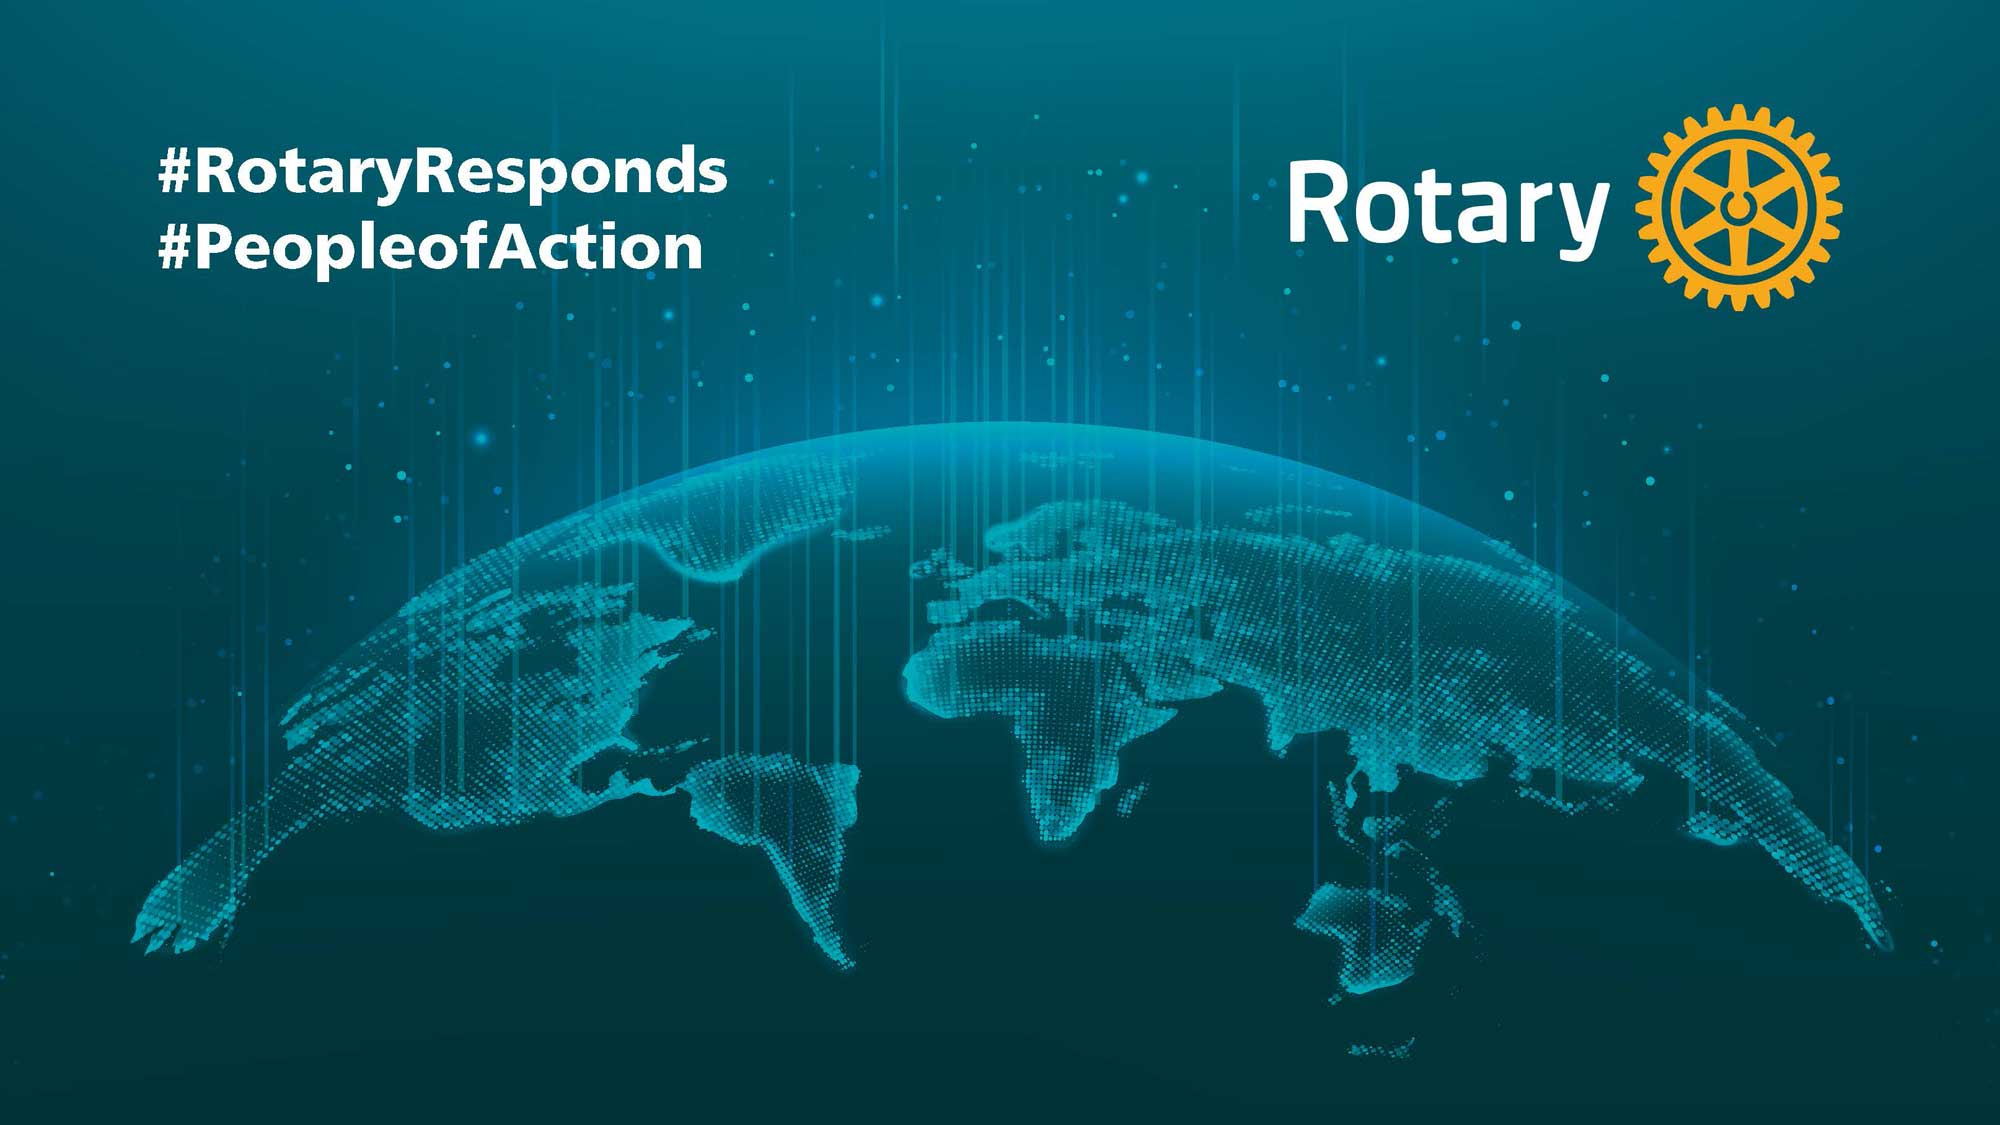 Banner, #RotaryResponds, #PeopleofAction